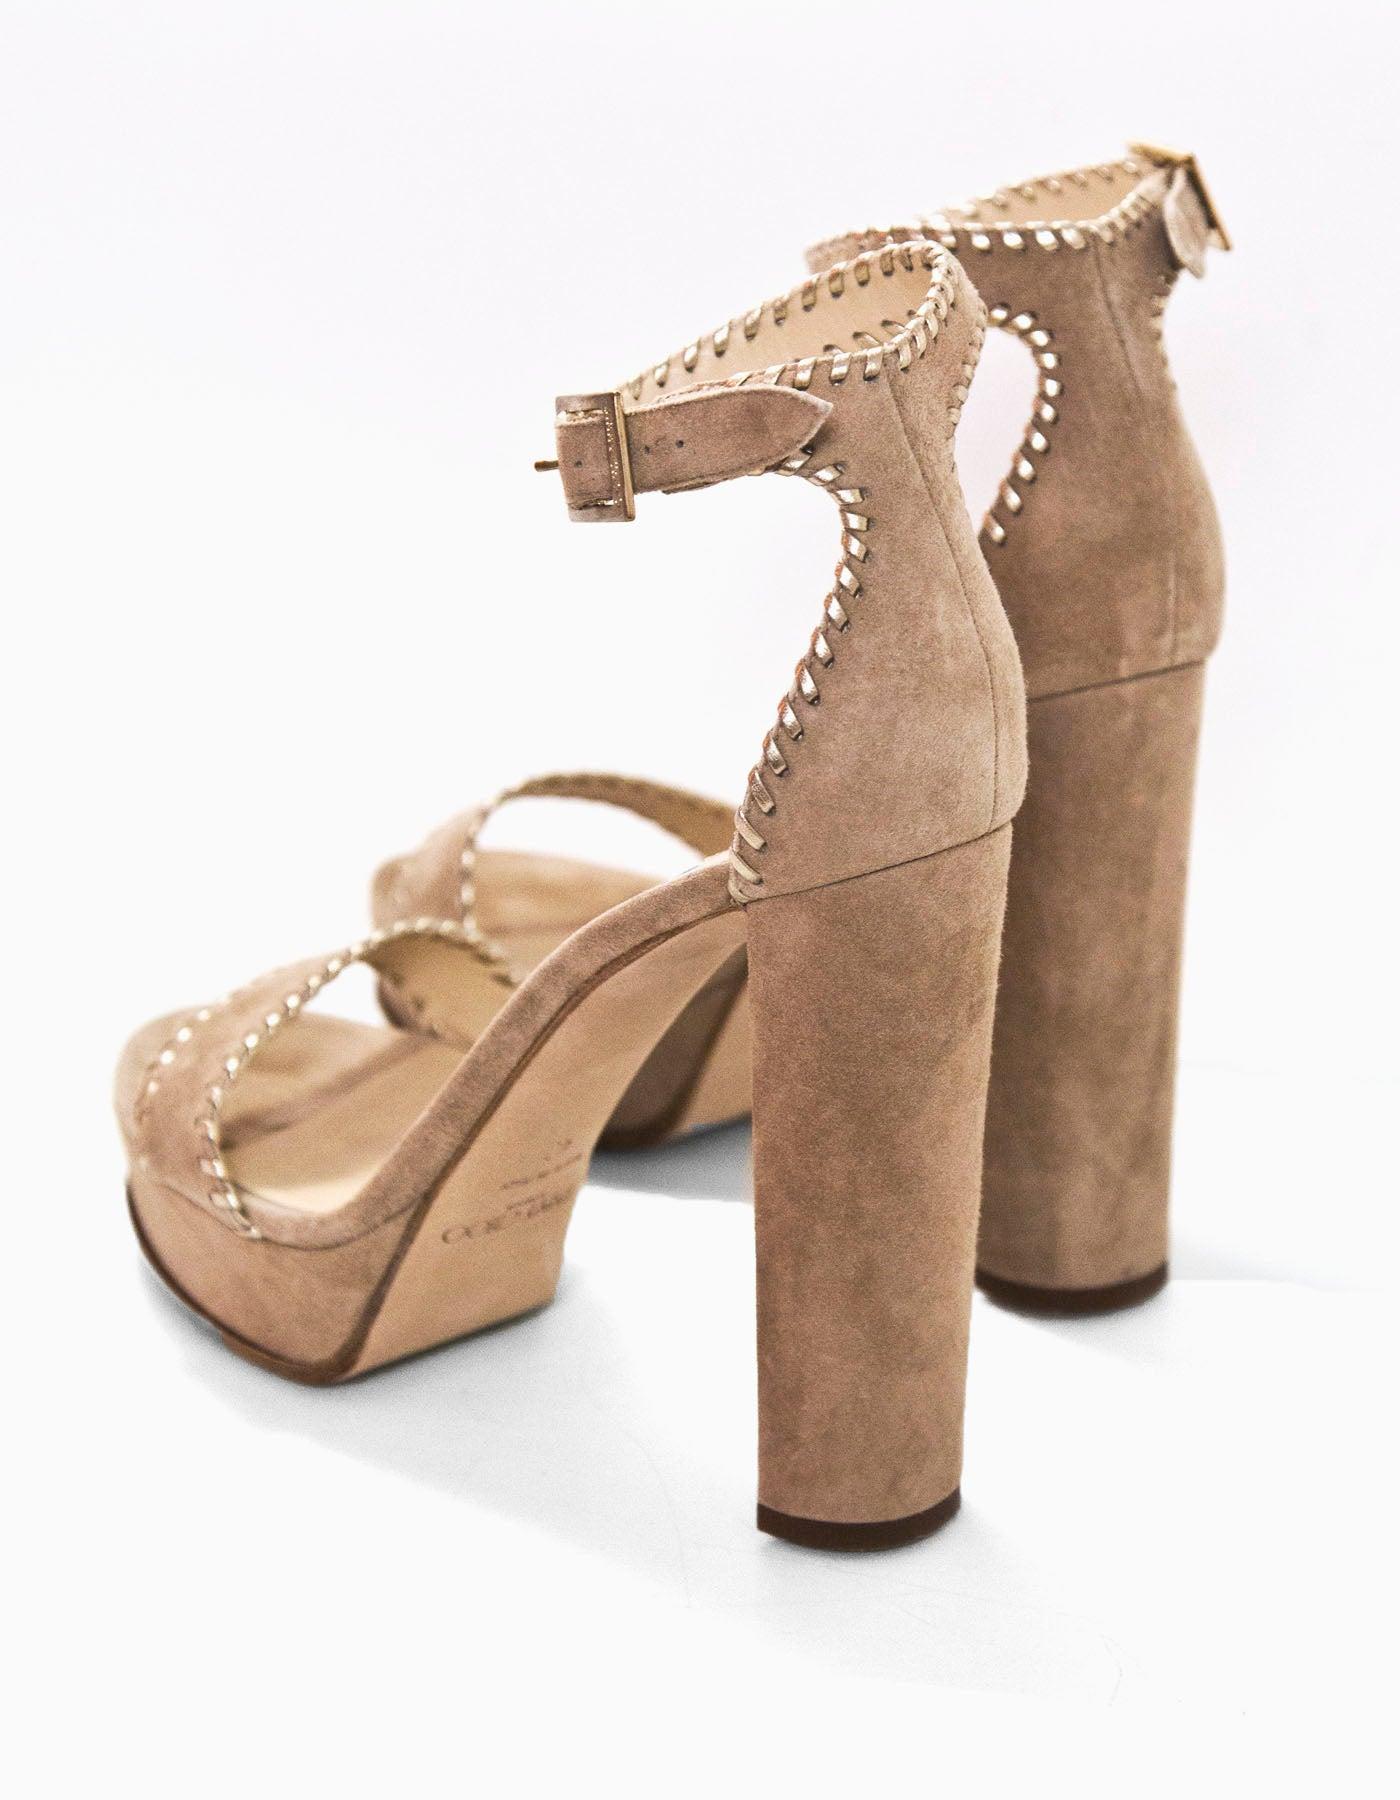 Jimmy Choo Woman Holly Suede Platform Sandals Tan Size 40 Jimmy Choo London 0BC9w